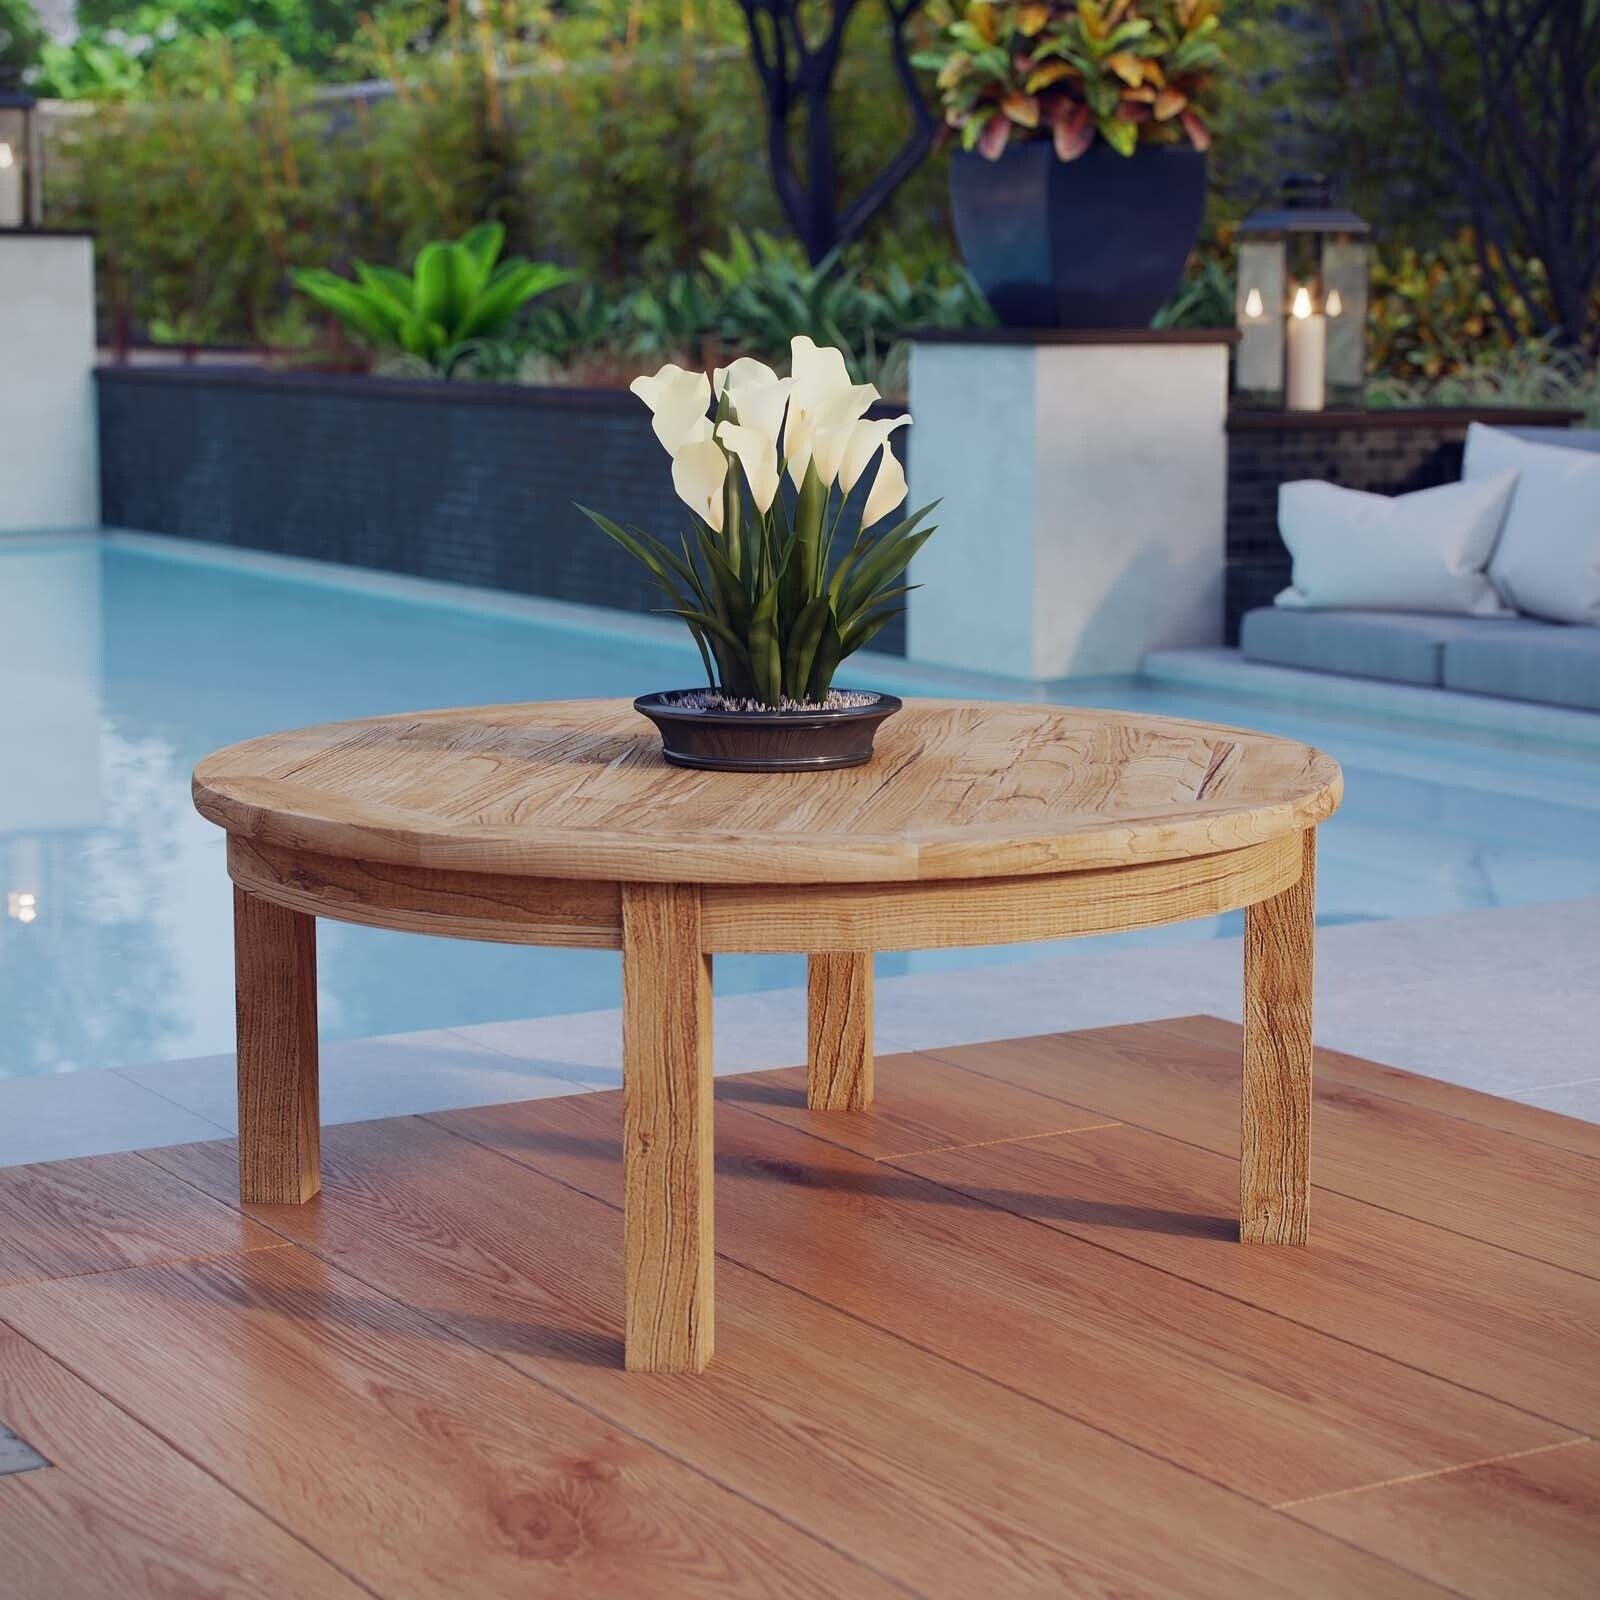 Havenside Home Pocet Outdoor Round Teak Coffee Table